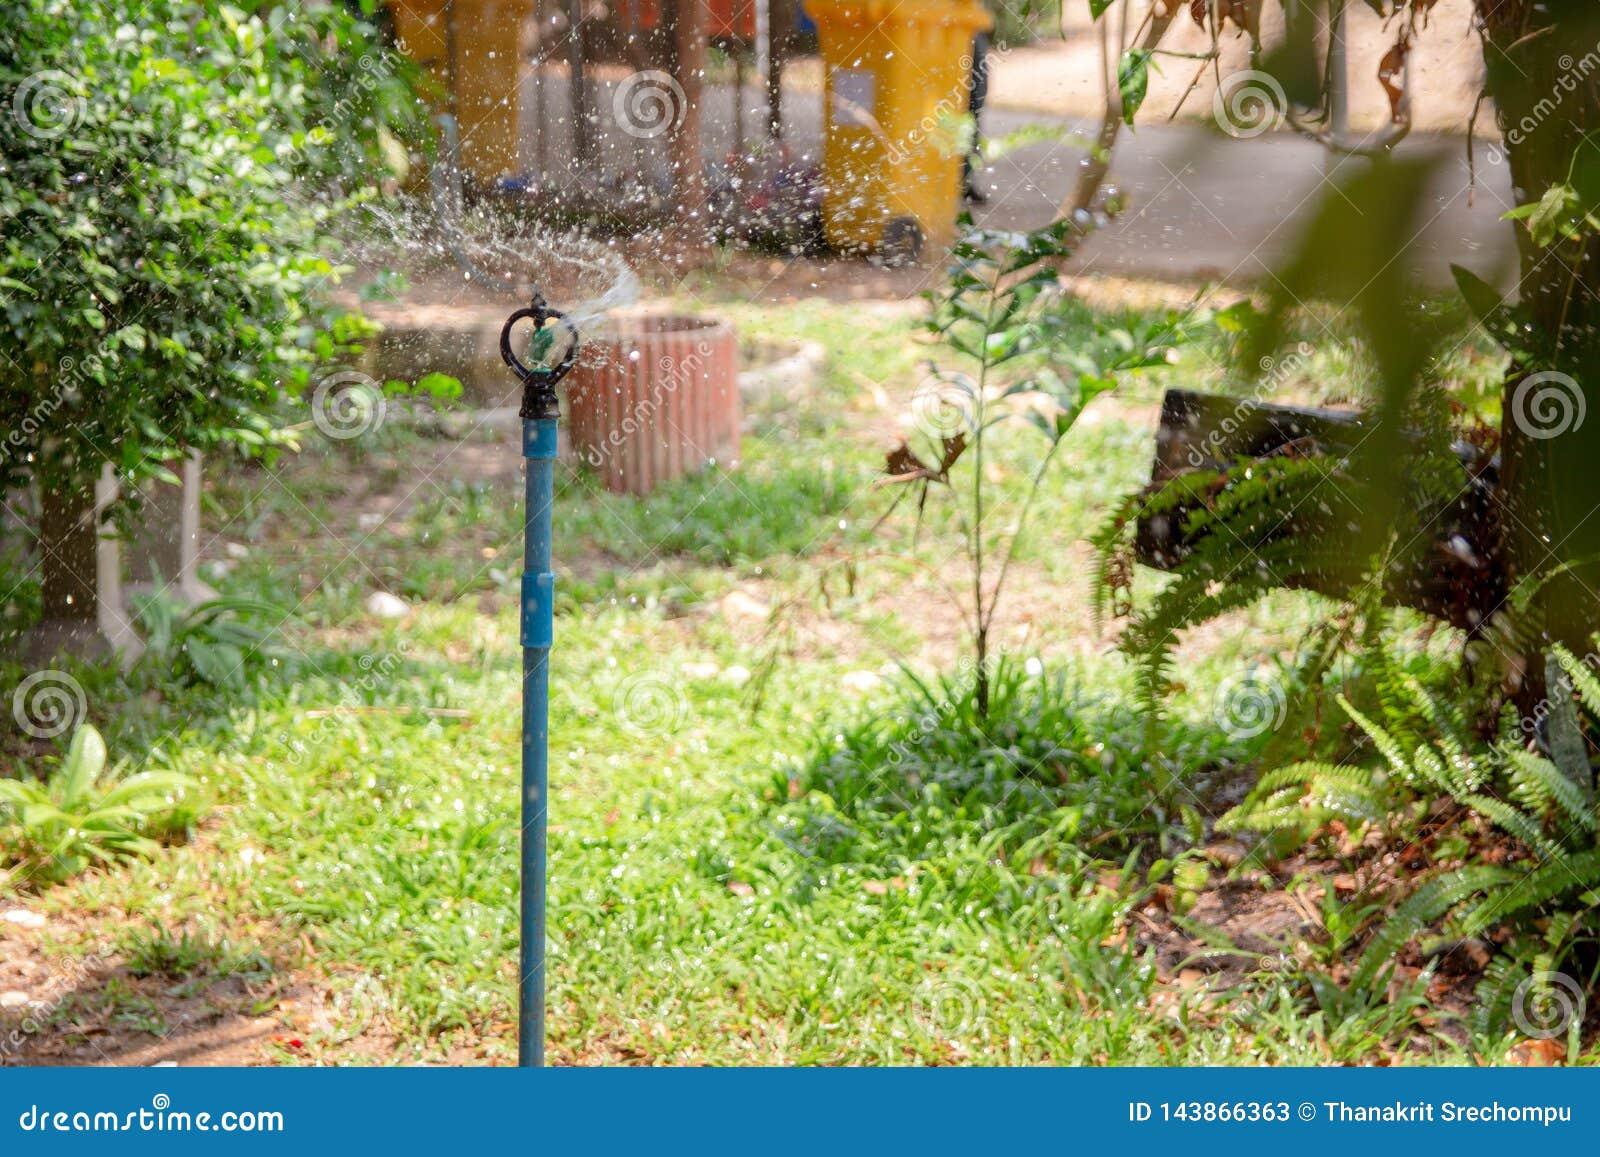 Springer nawadnia rośliny